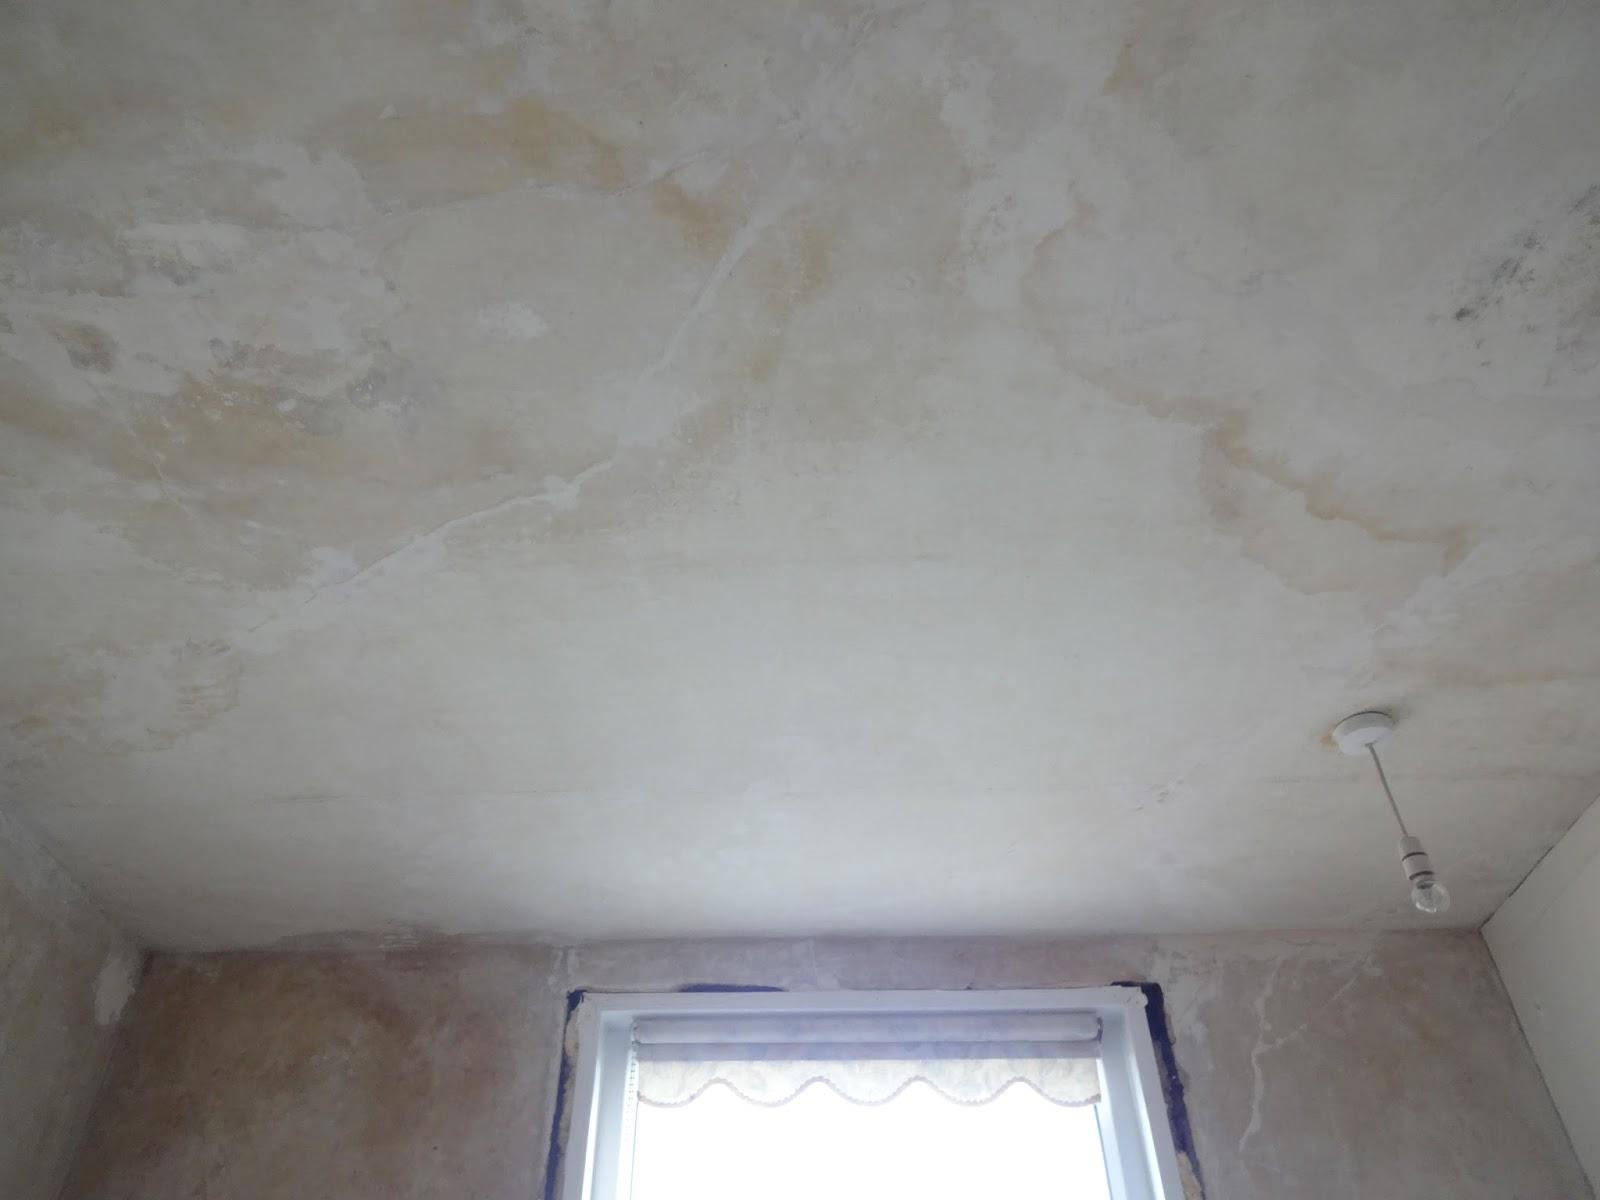 concept repair plastering plaster ceiling the water repairs damage